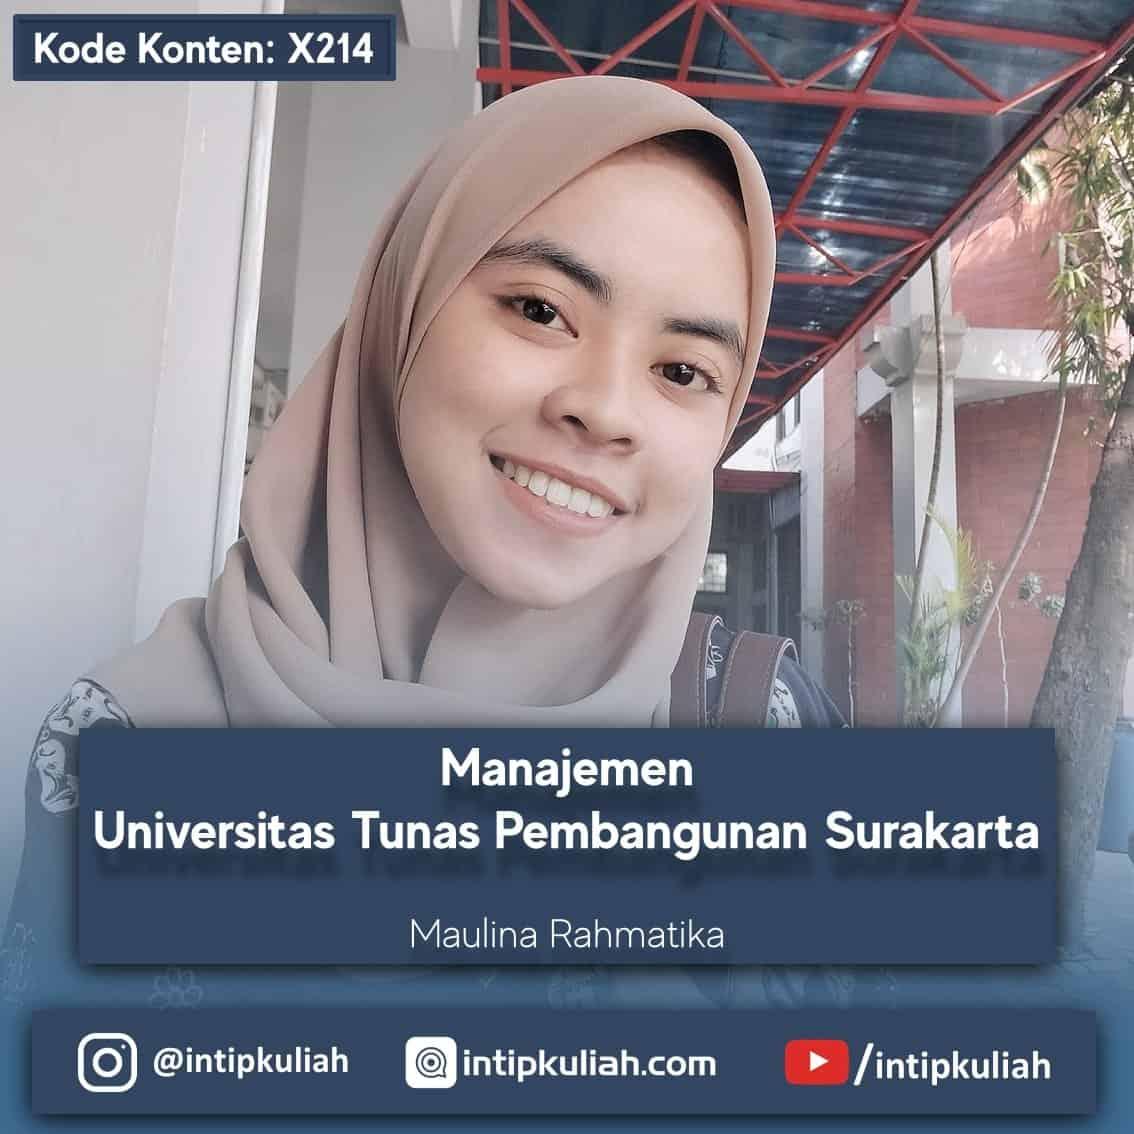 Manajemen Universitas Tunas Pembangunan Surakarta (Maulina)